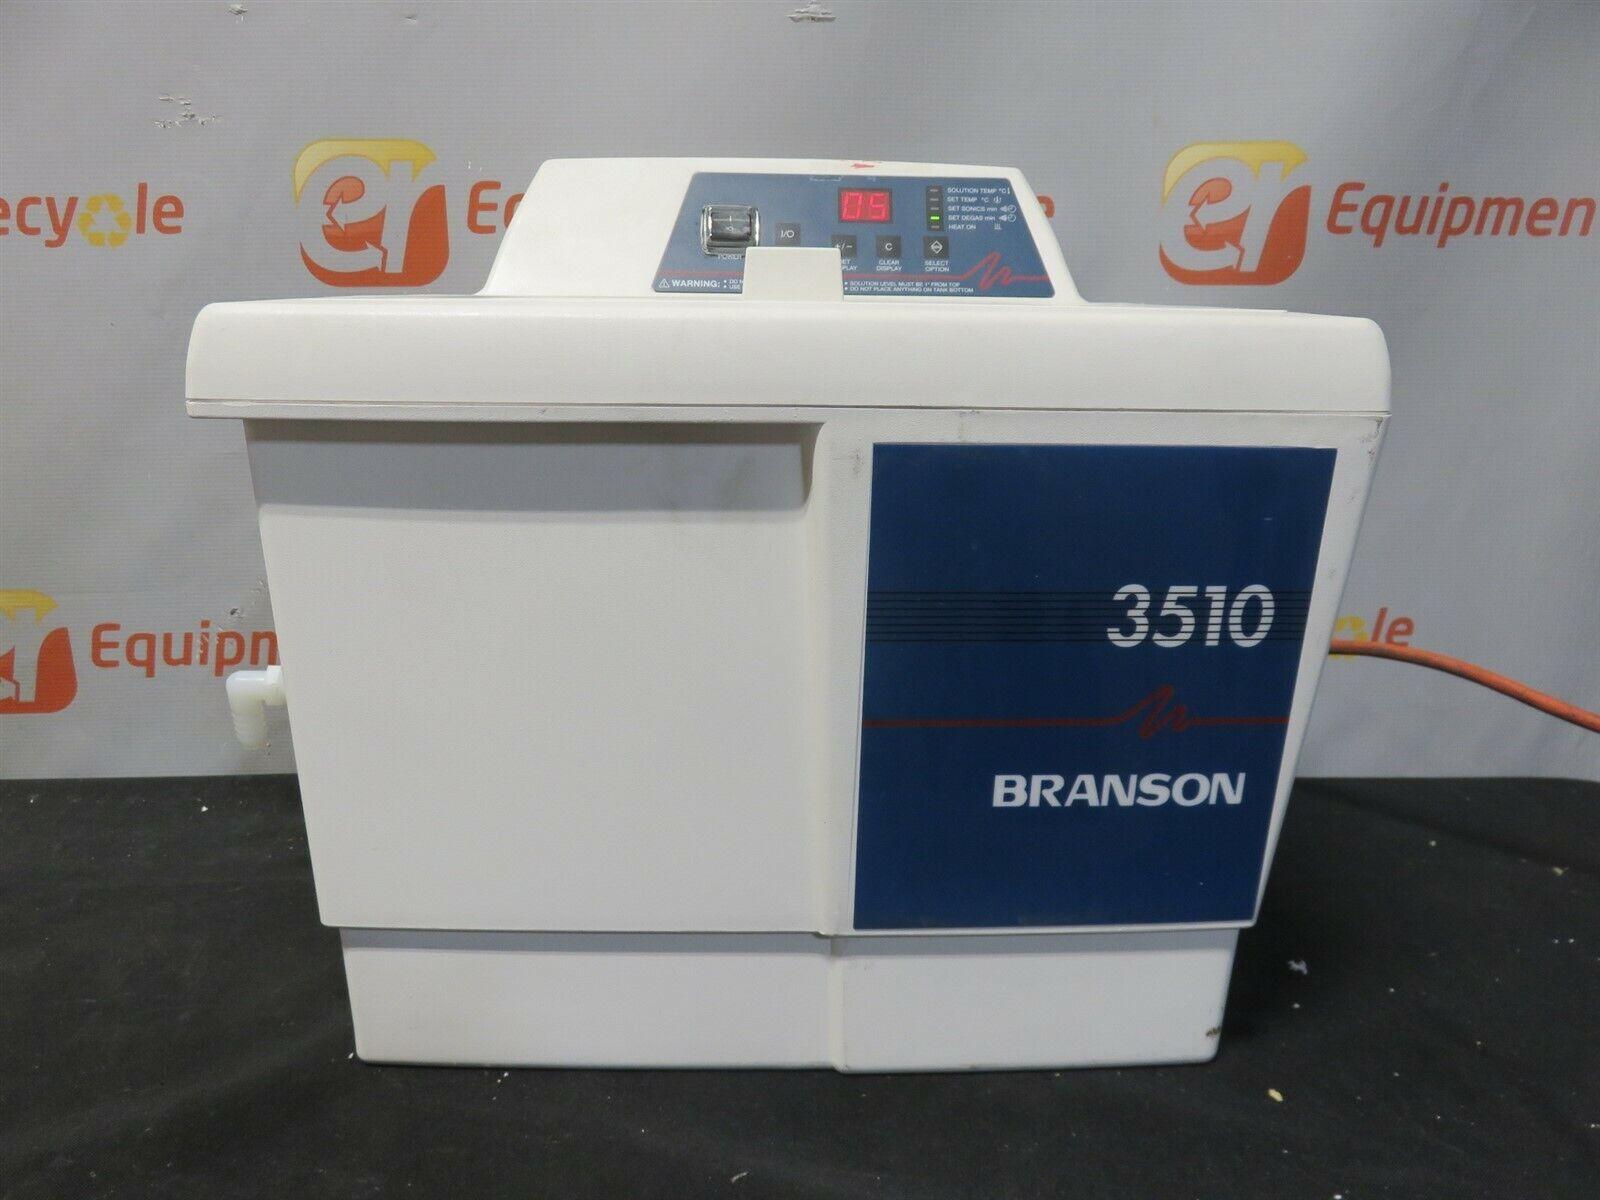 Branson Bransonic 3510 Ultrasonic Cleaner 3510R-DTH Water Bath